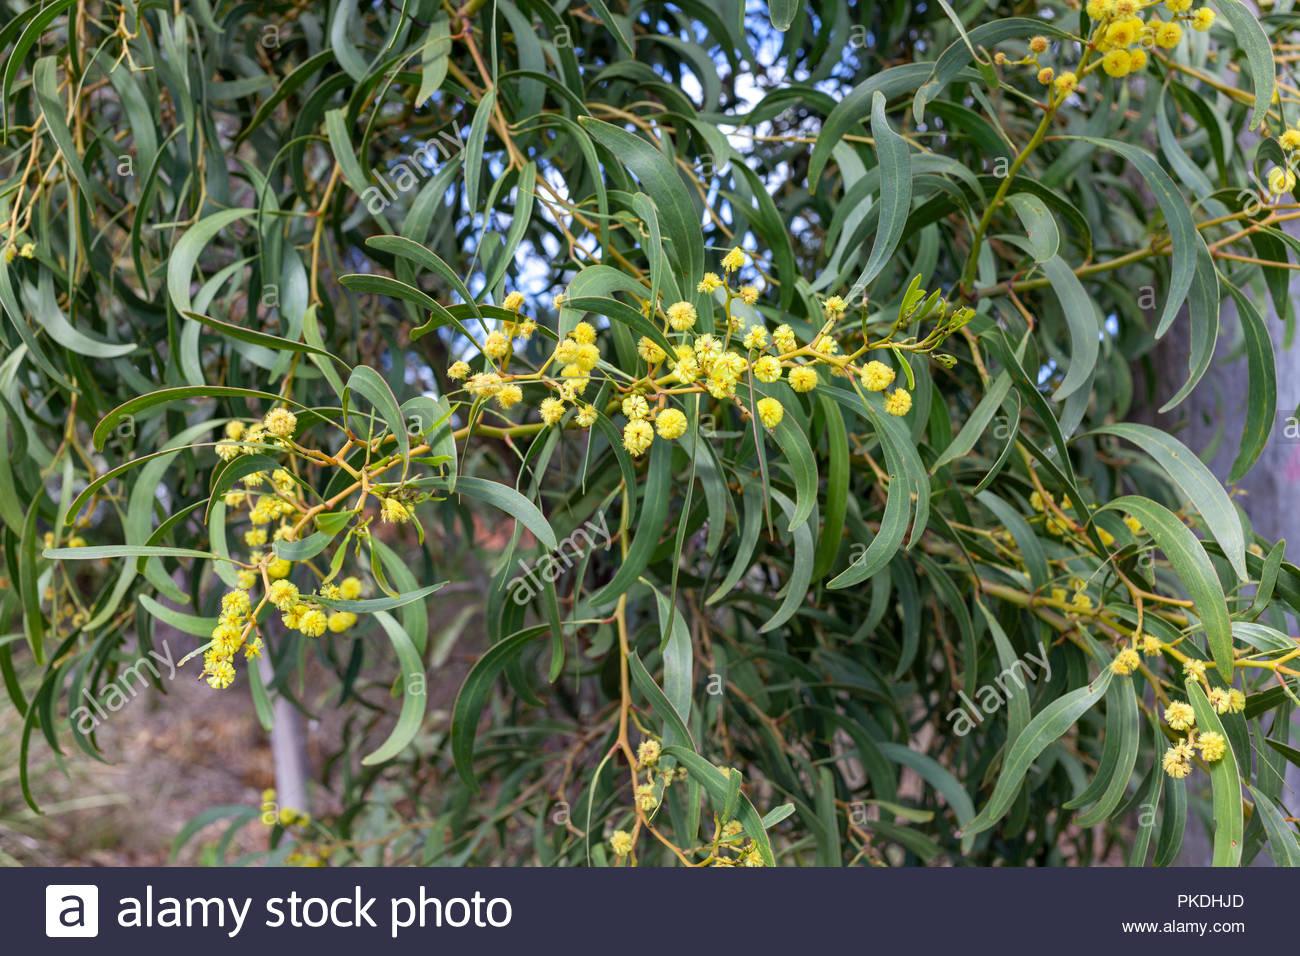 Australian spring flowers stock photos australian spring flowers australian wattle tree flowering in spring stock image mightylinksfo